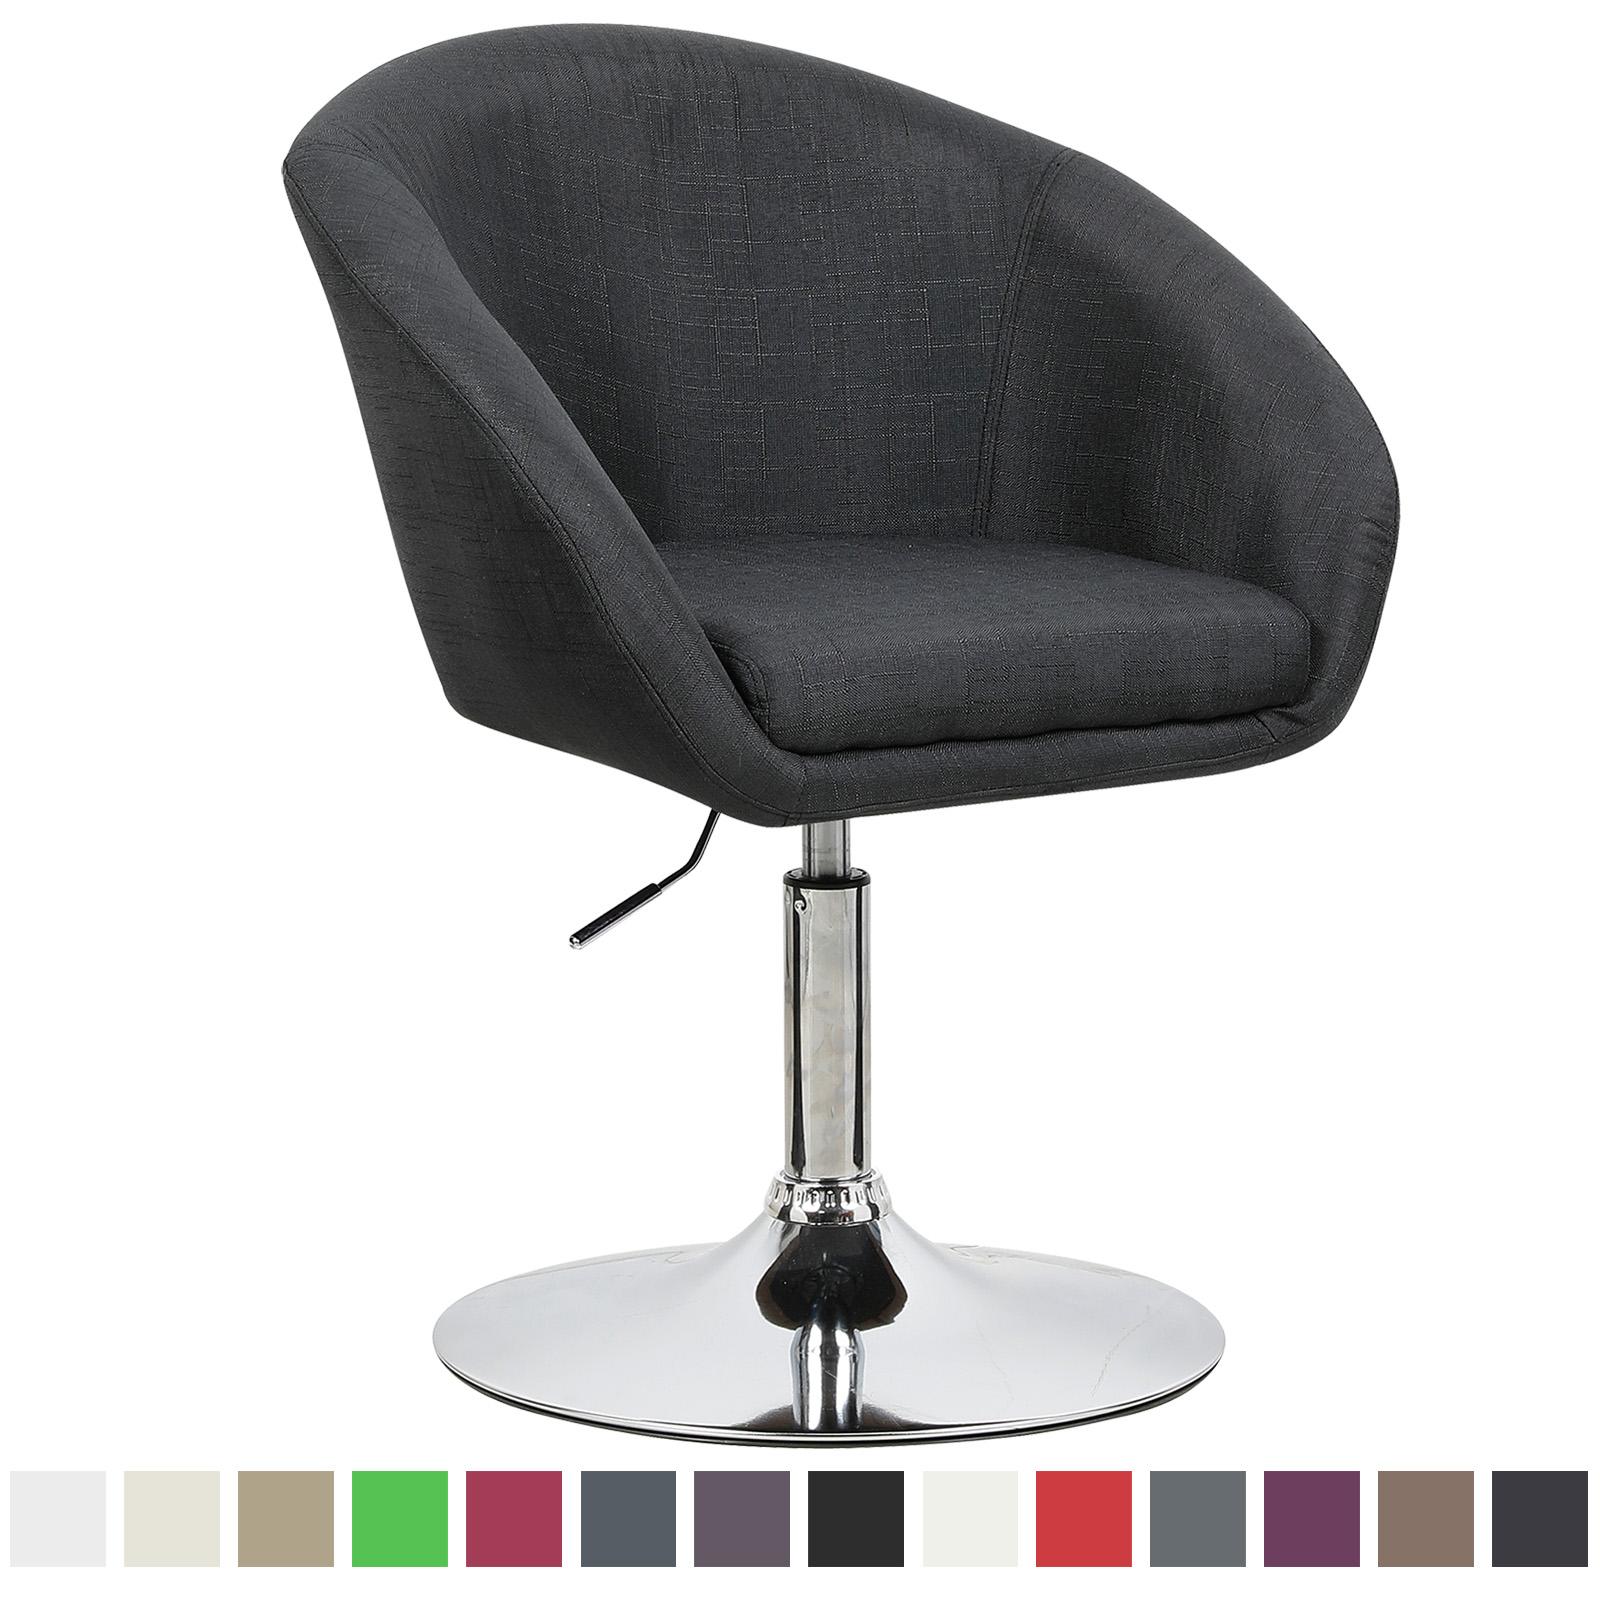 Barsessel Barhocker Clubsessel drehbar Loungesessel Stuhl höhenverstellbar e158